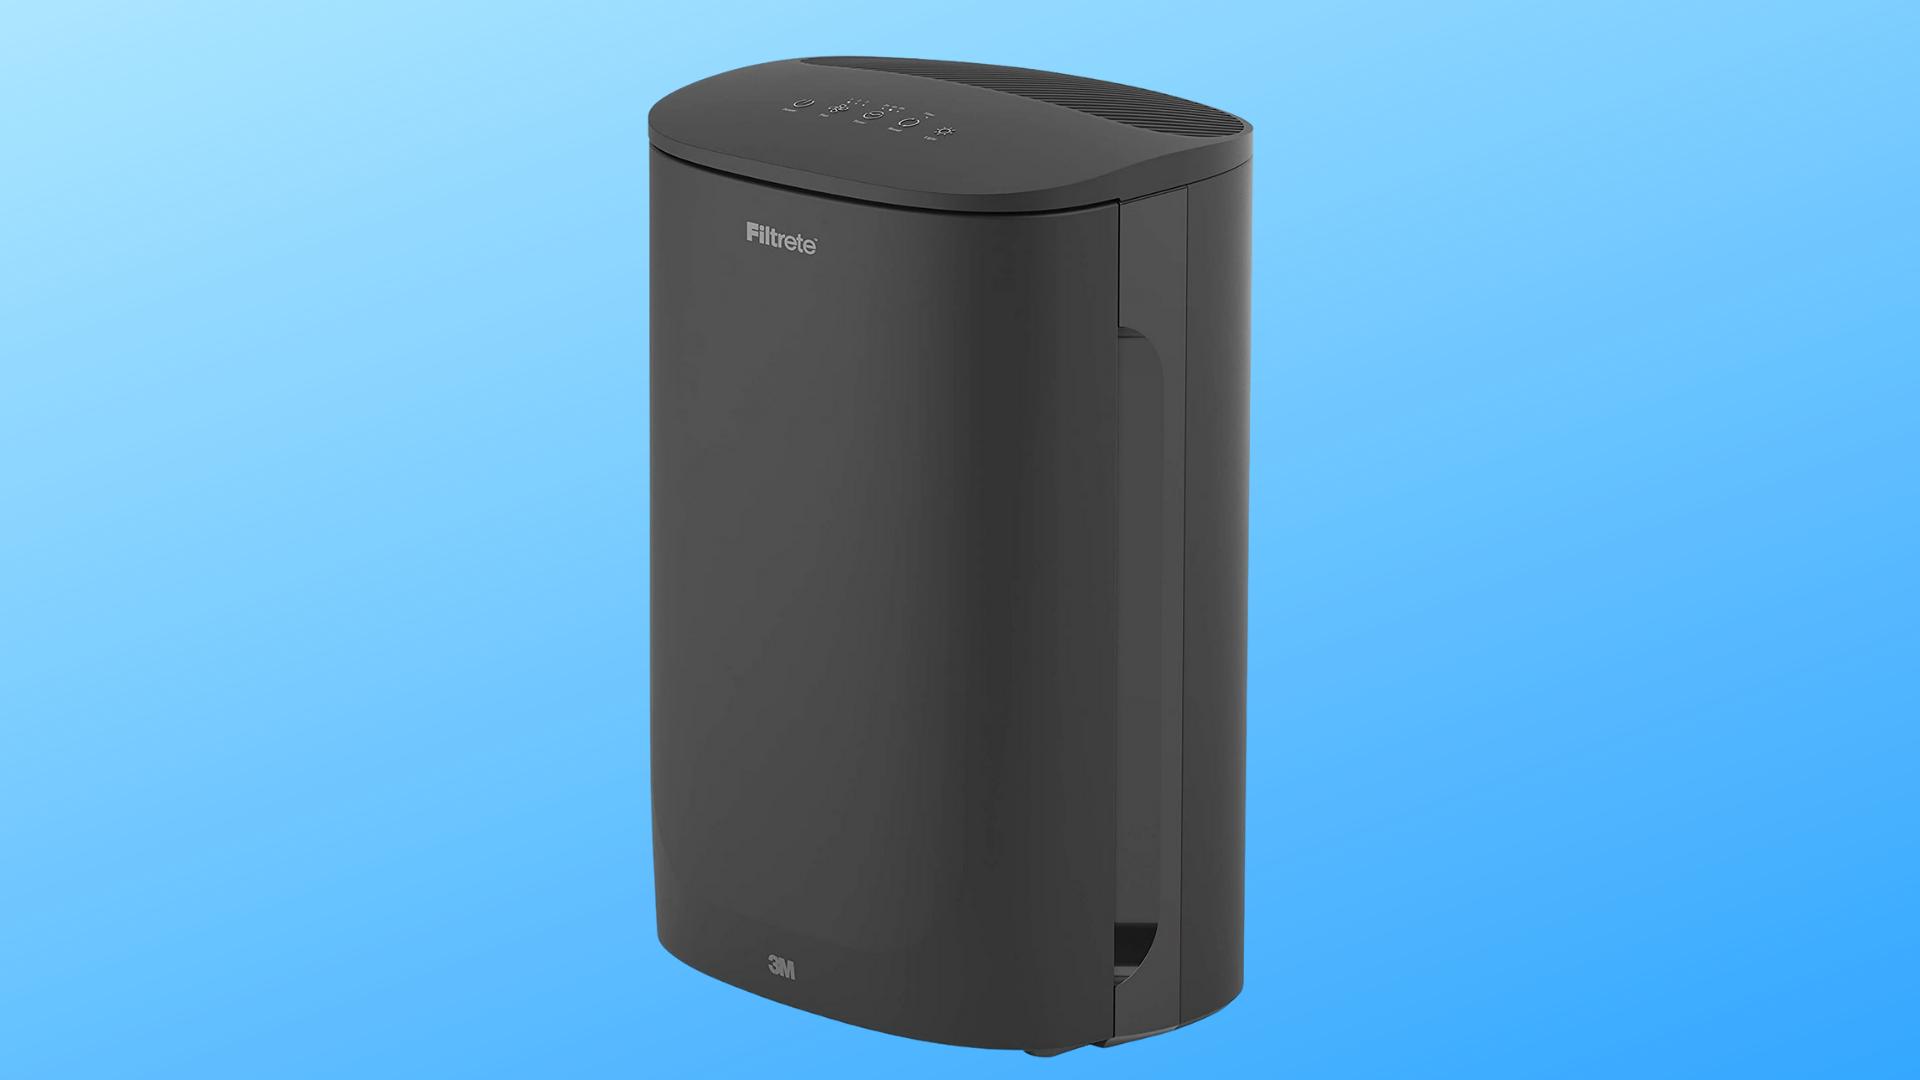 Filtrete best air purifier